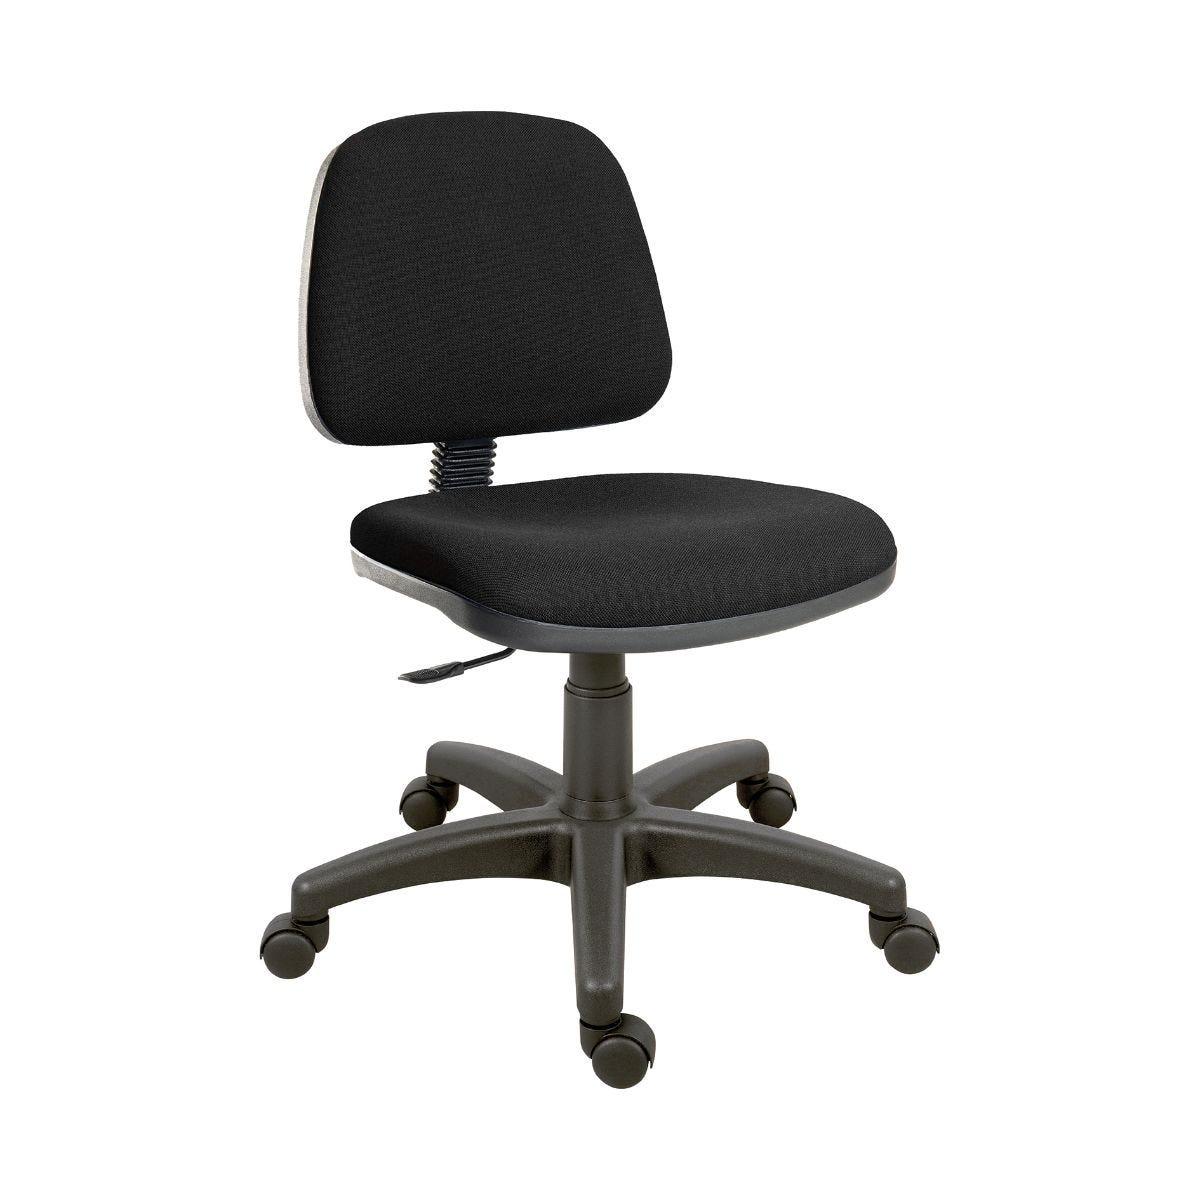 Office Chairs U0026 Seating Furniture U0026 Storage   Ryman